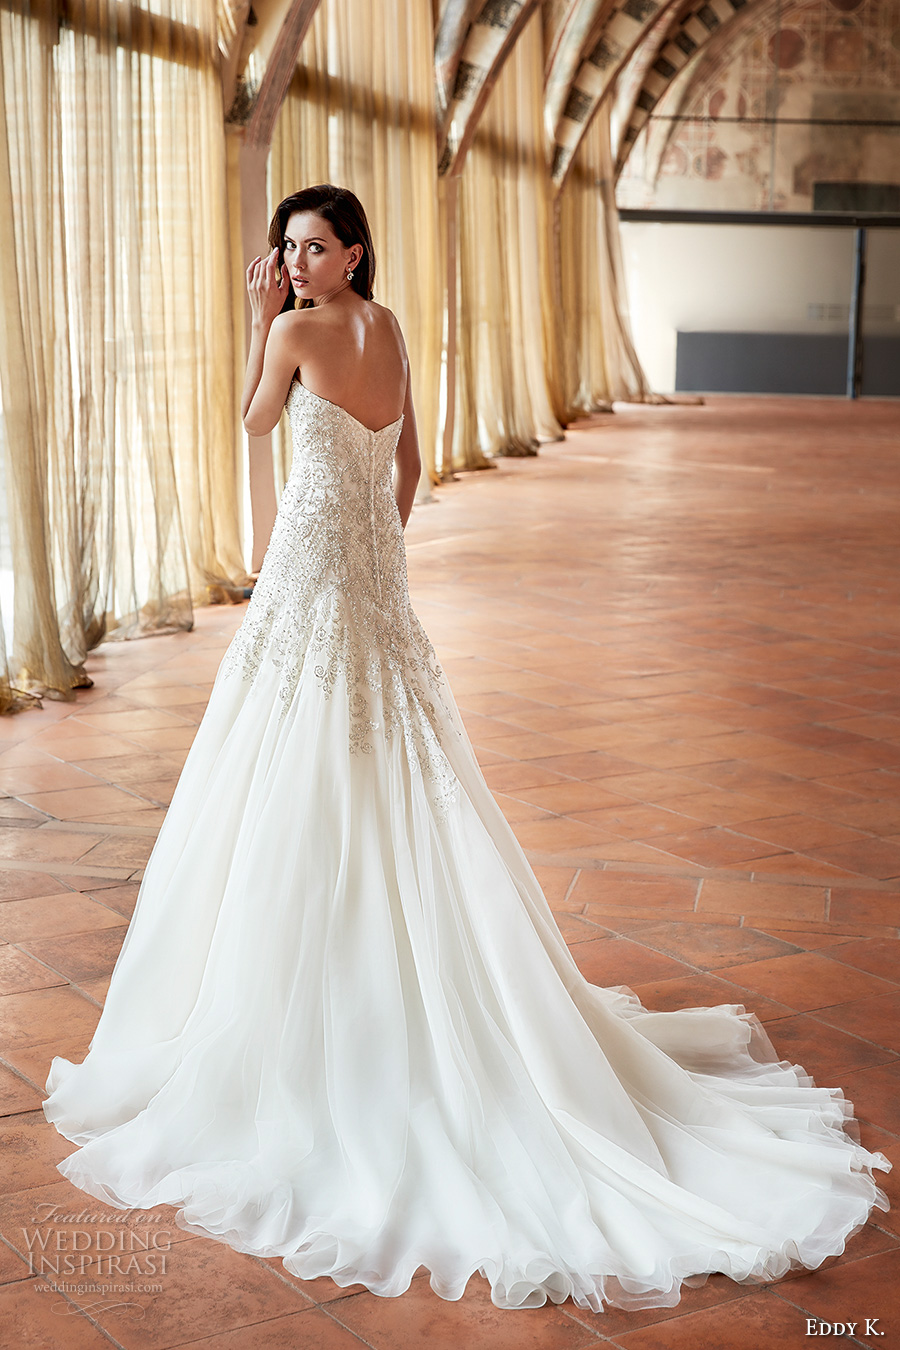 Paloma Blanca Wedding Dresses For Sale 82 Vintage eddy k couture bridal